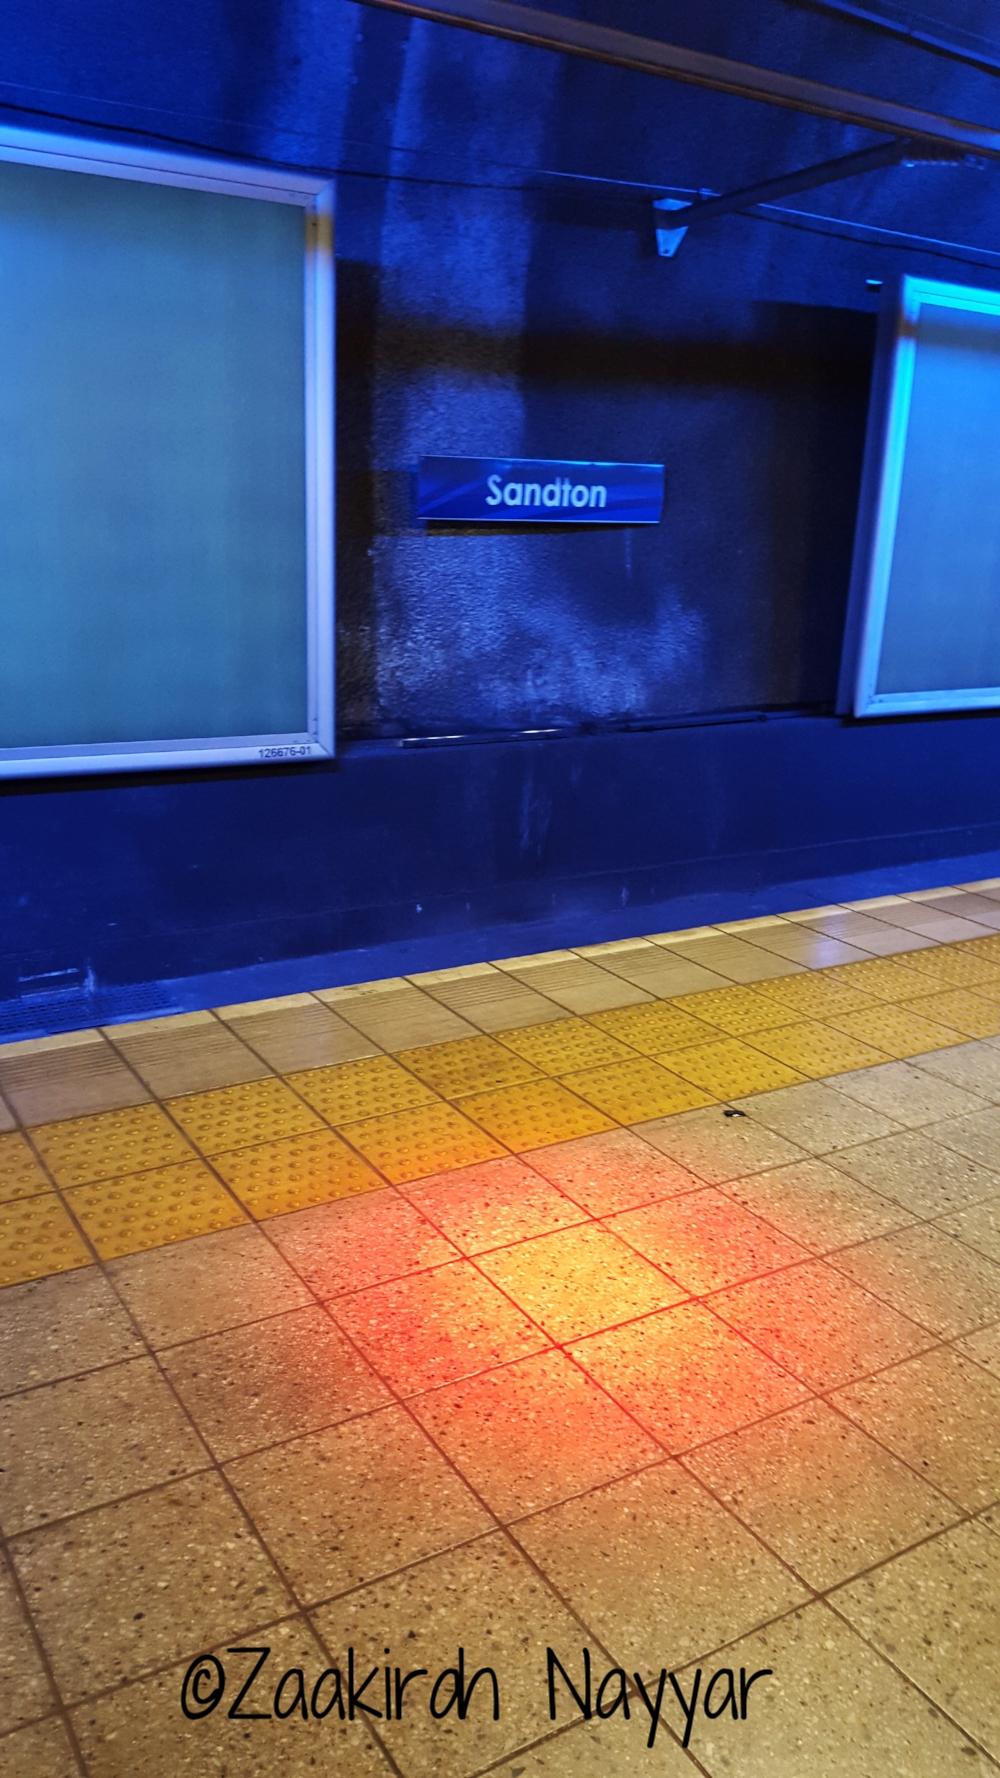 Sandton Gautrain Station